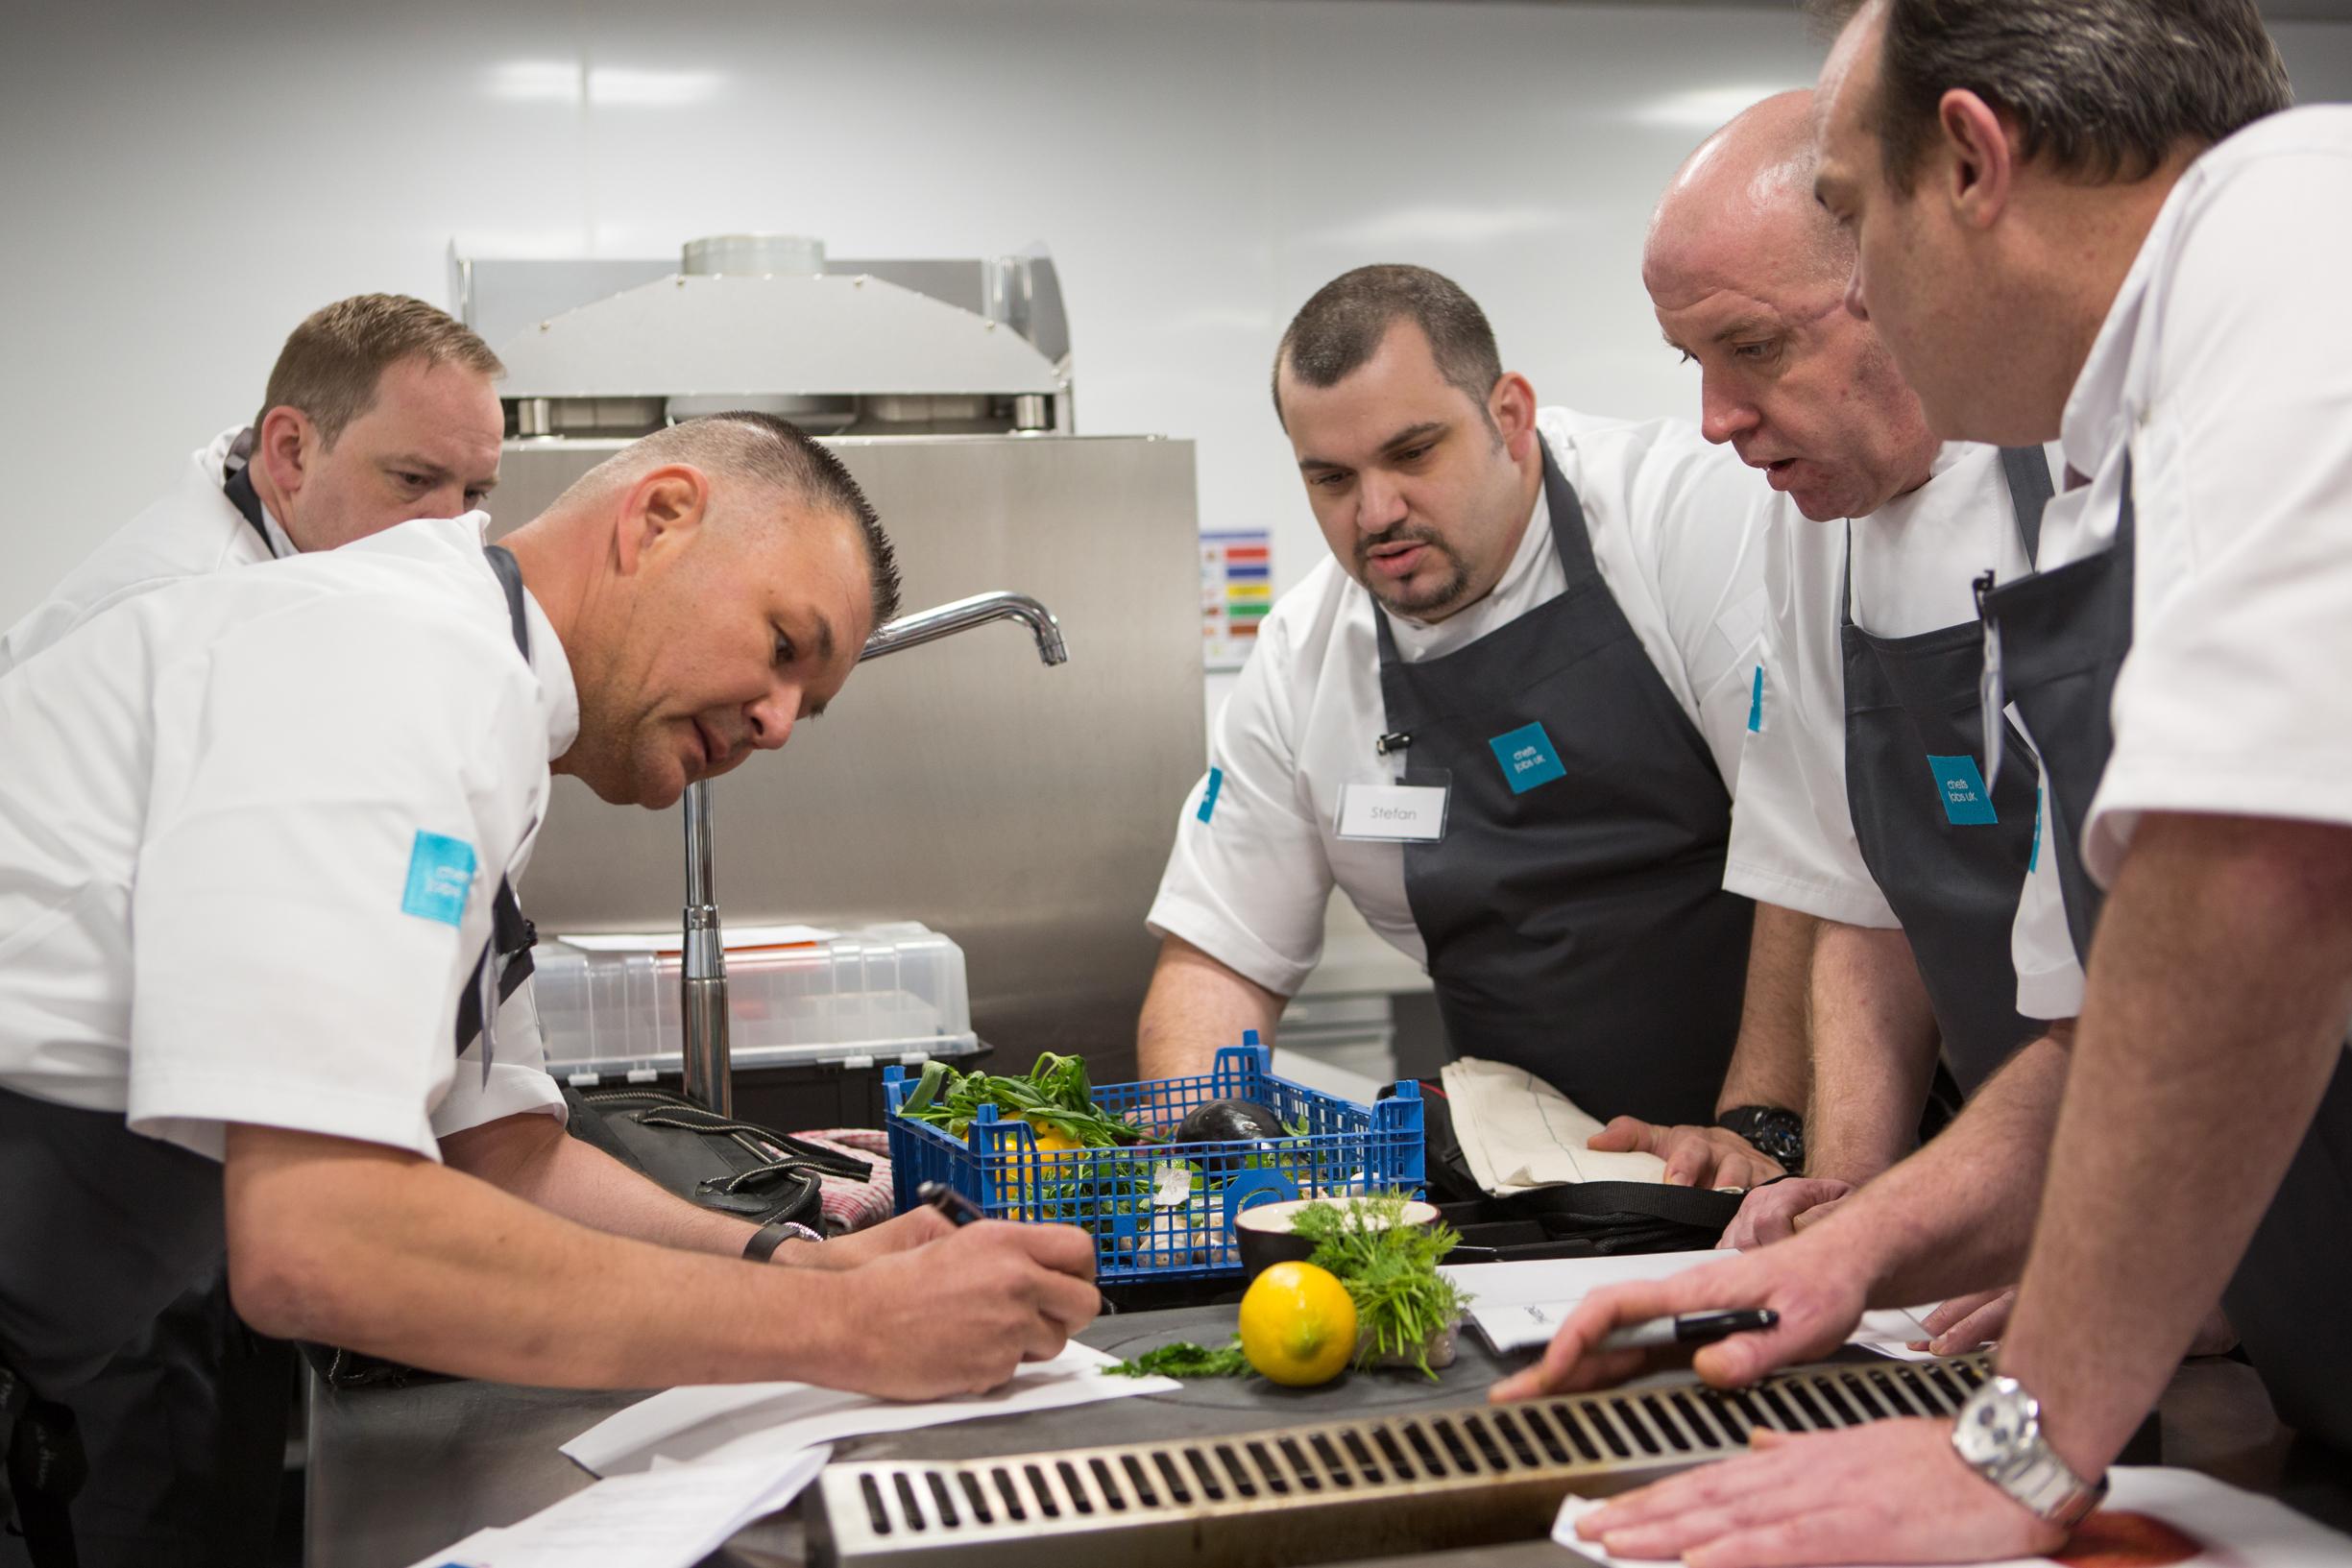 Chef Jobs In Hong Kong